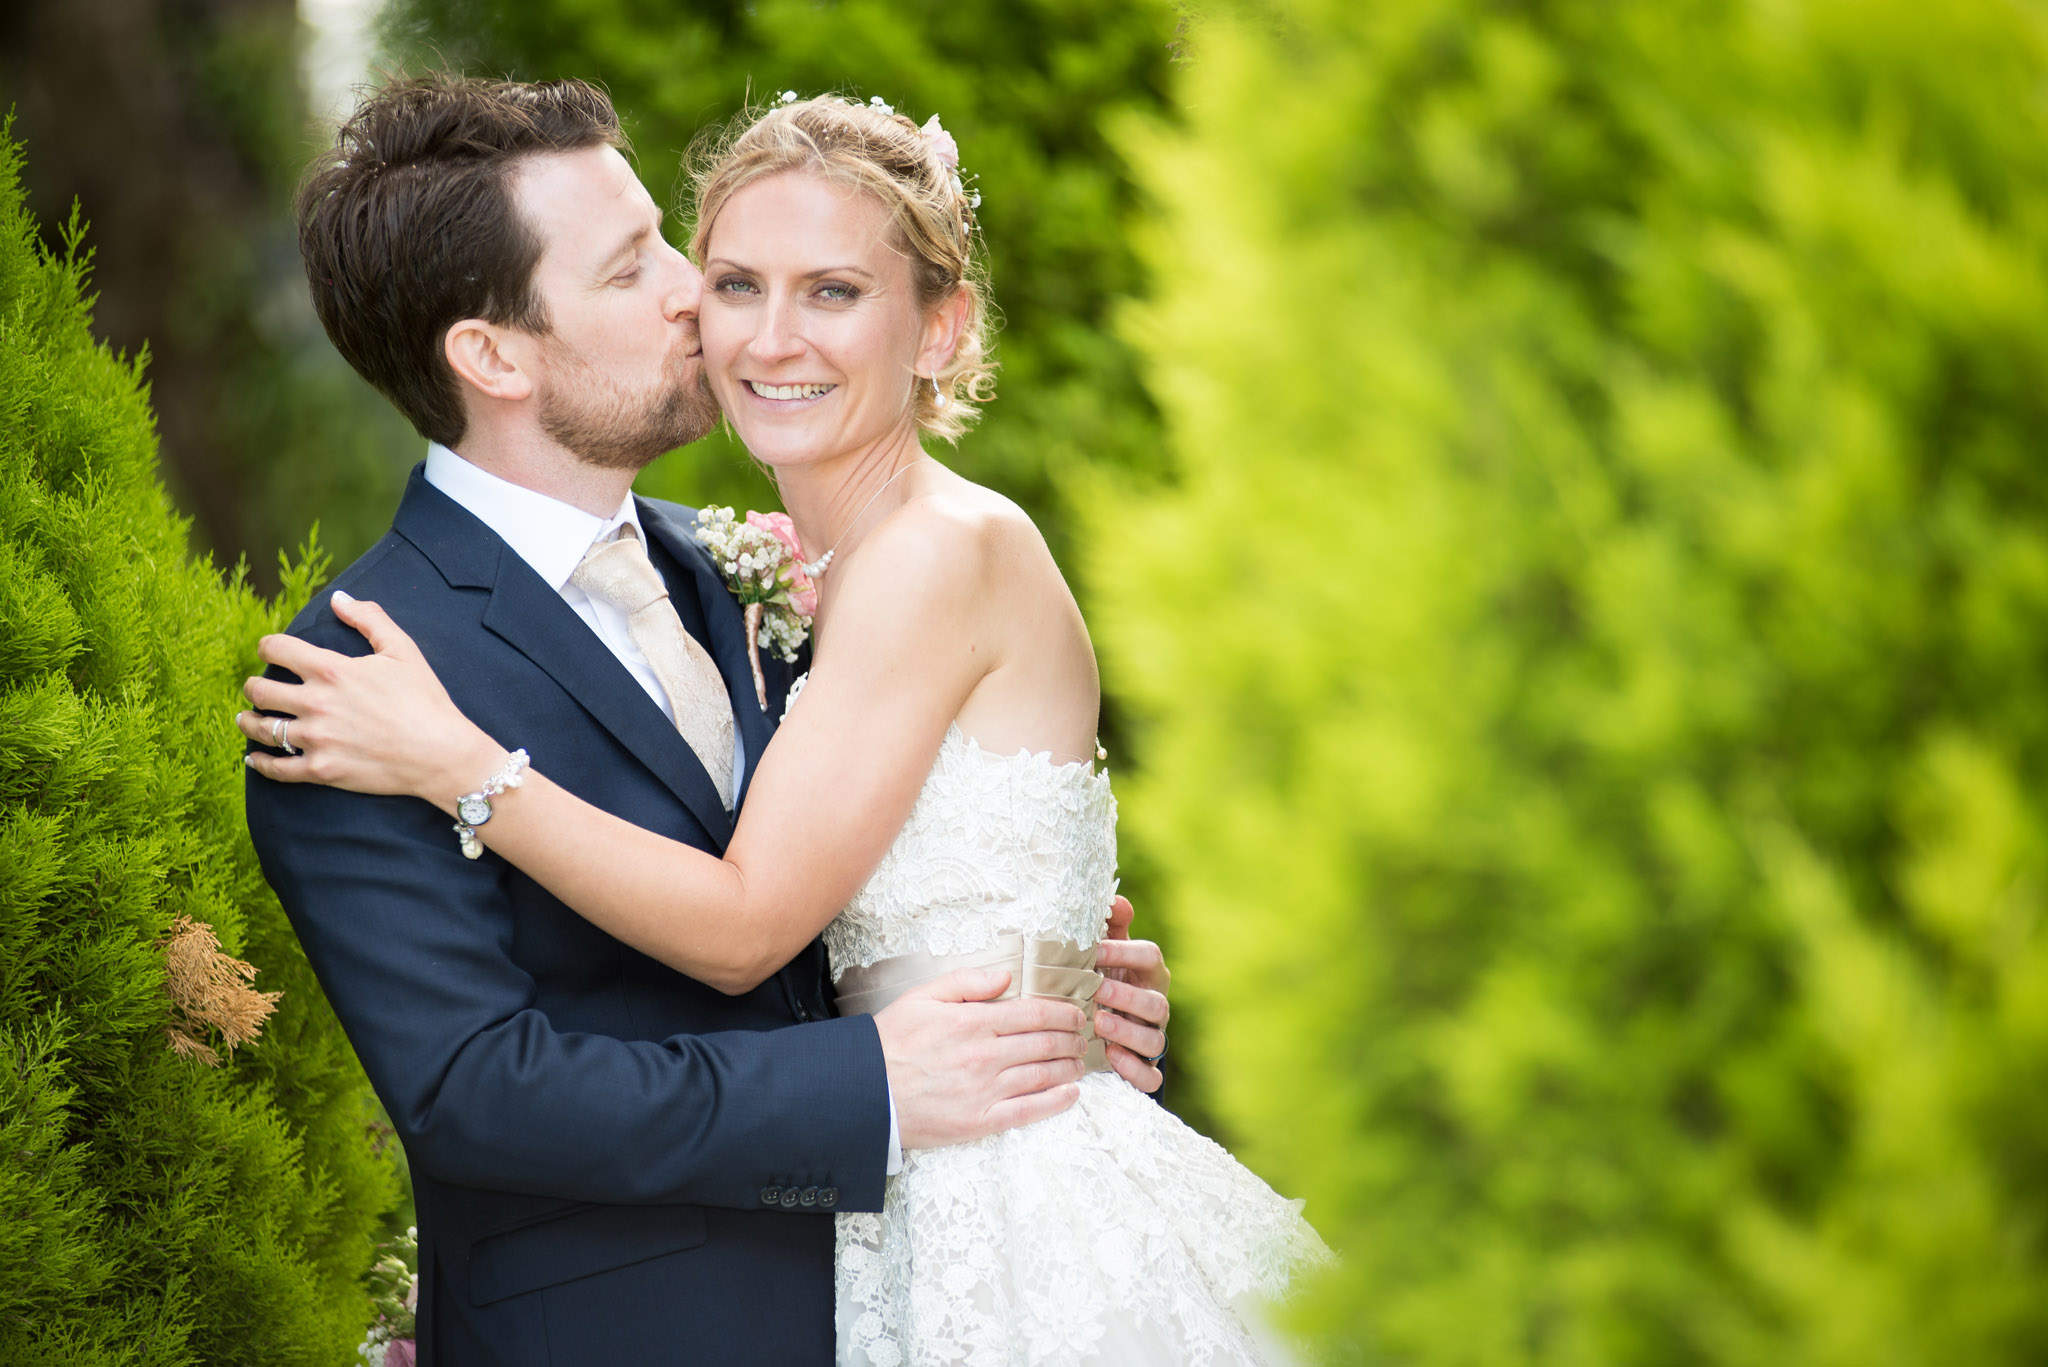 Wedding Photographers Manor House Hotel Penarth